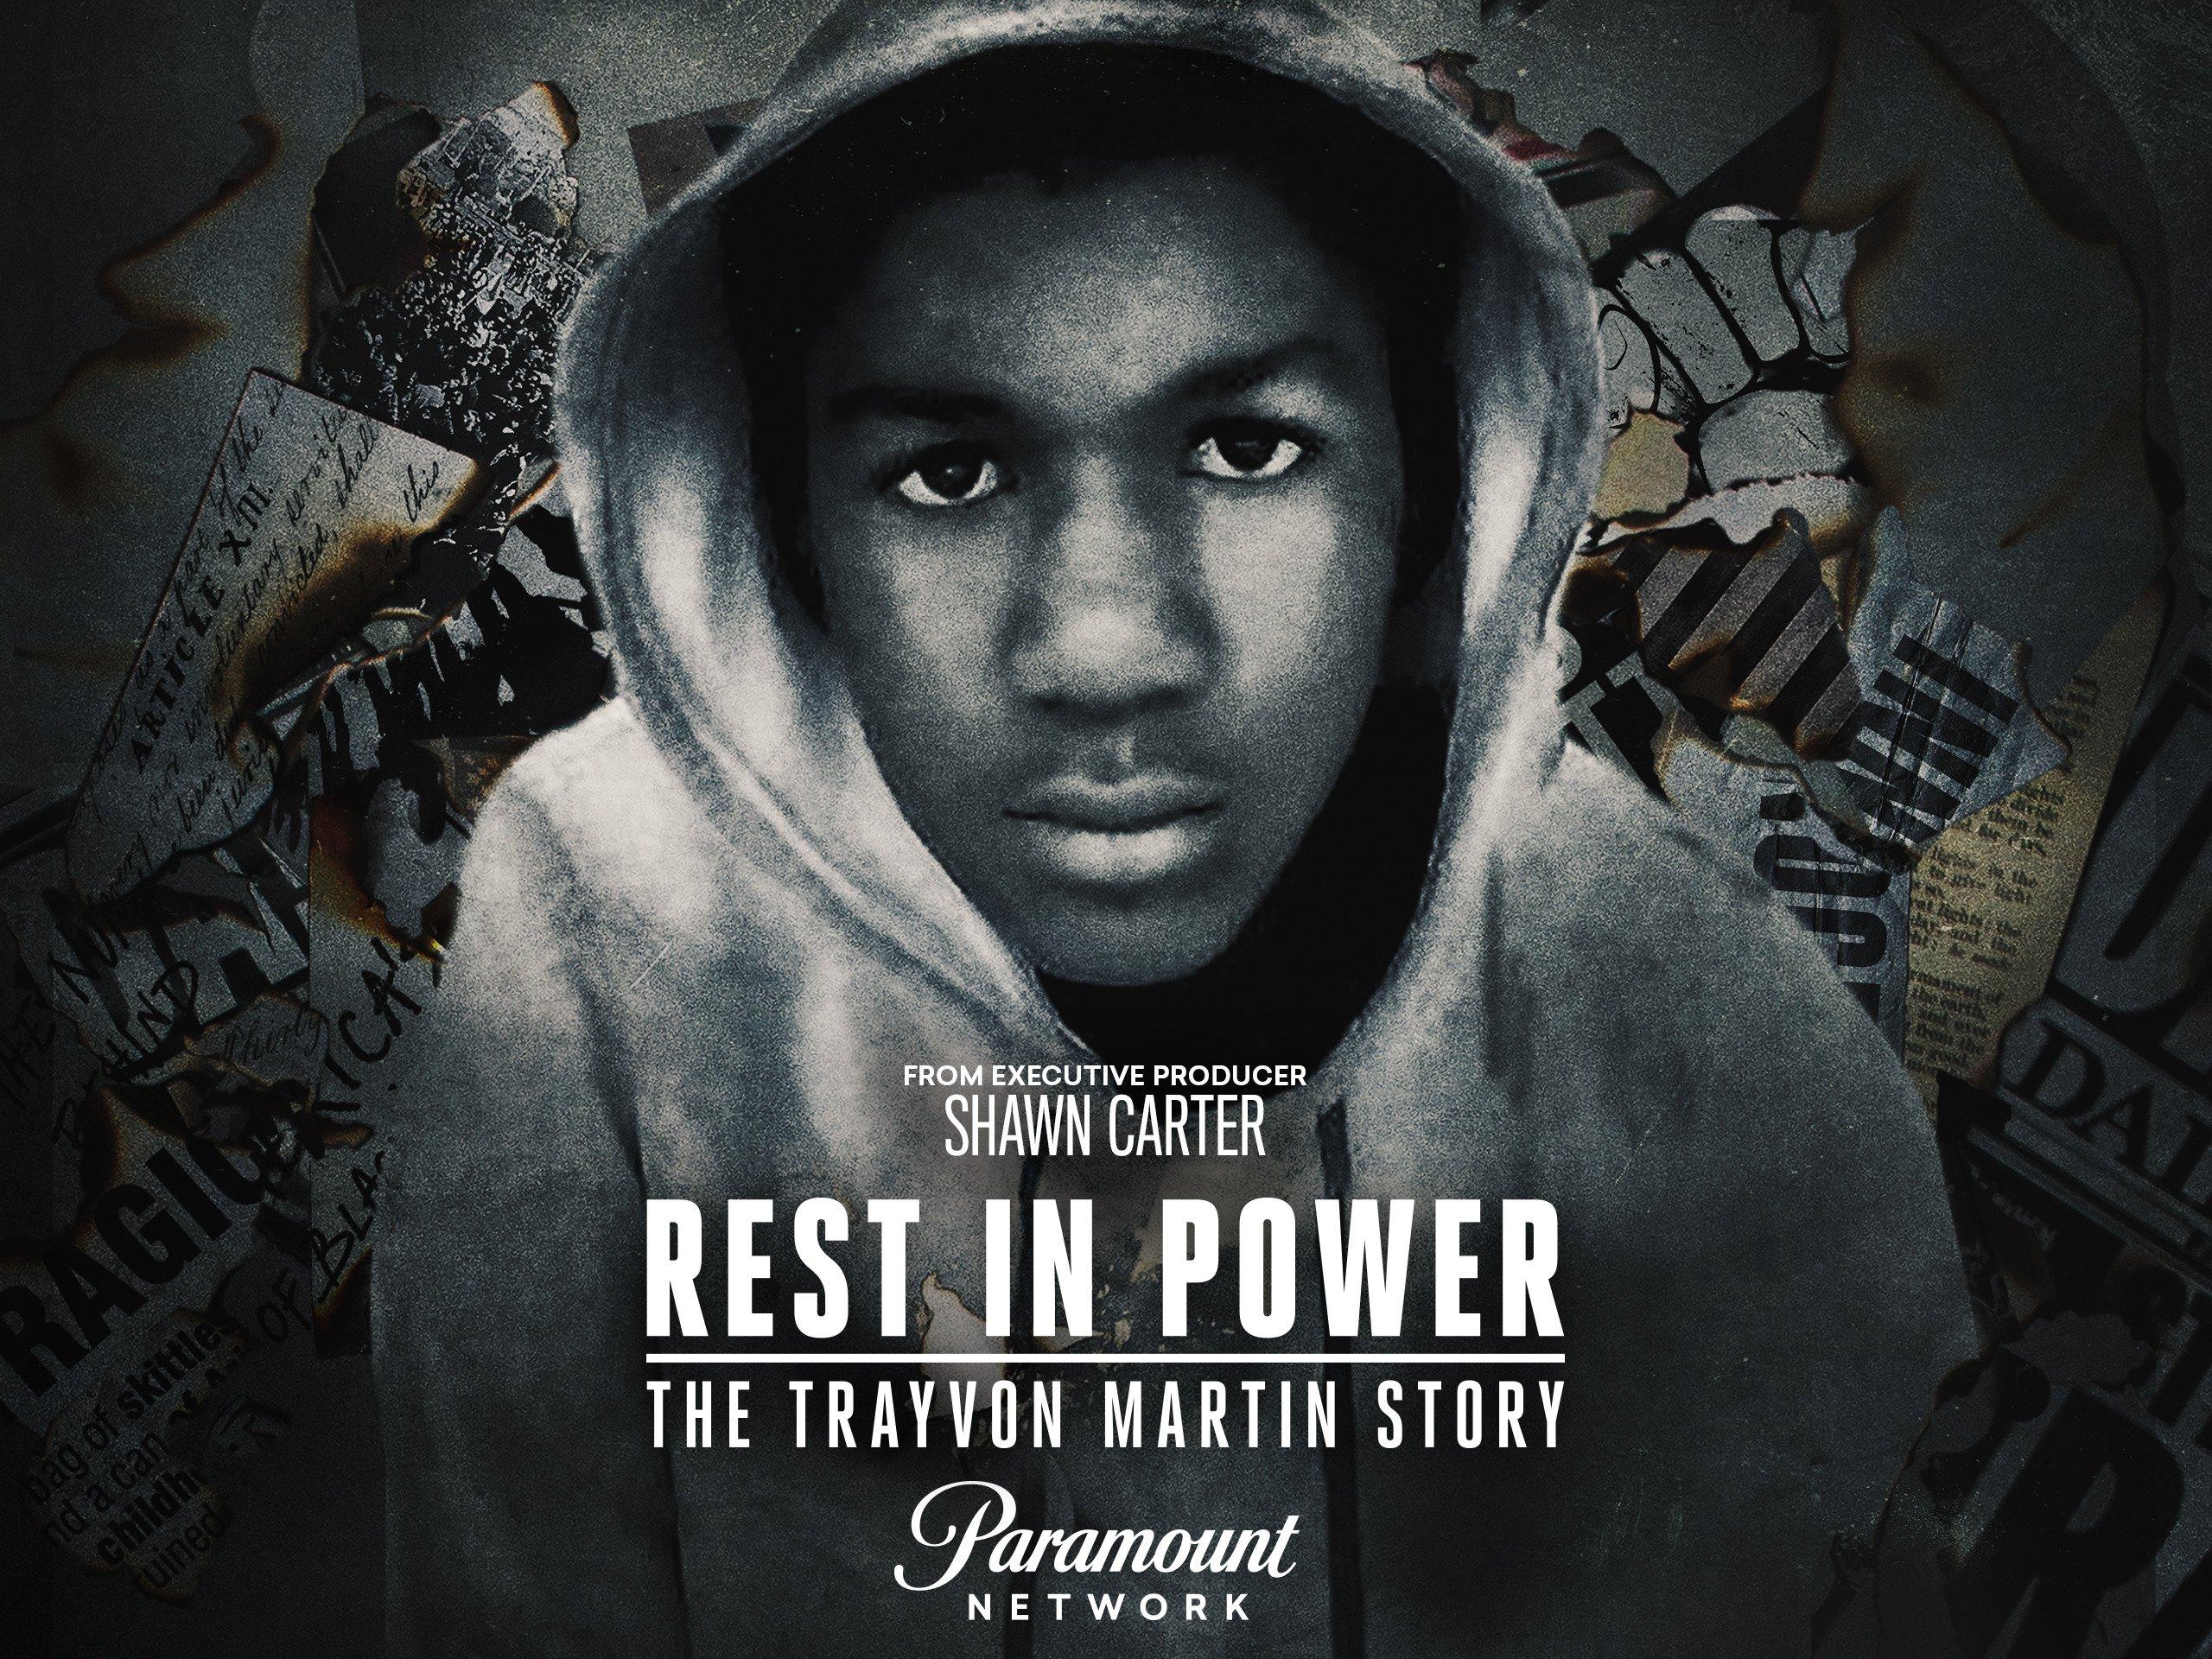 Trayvon martin movie on bet tonight betting stats mlb pitchers